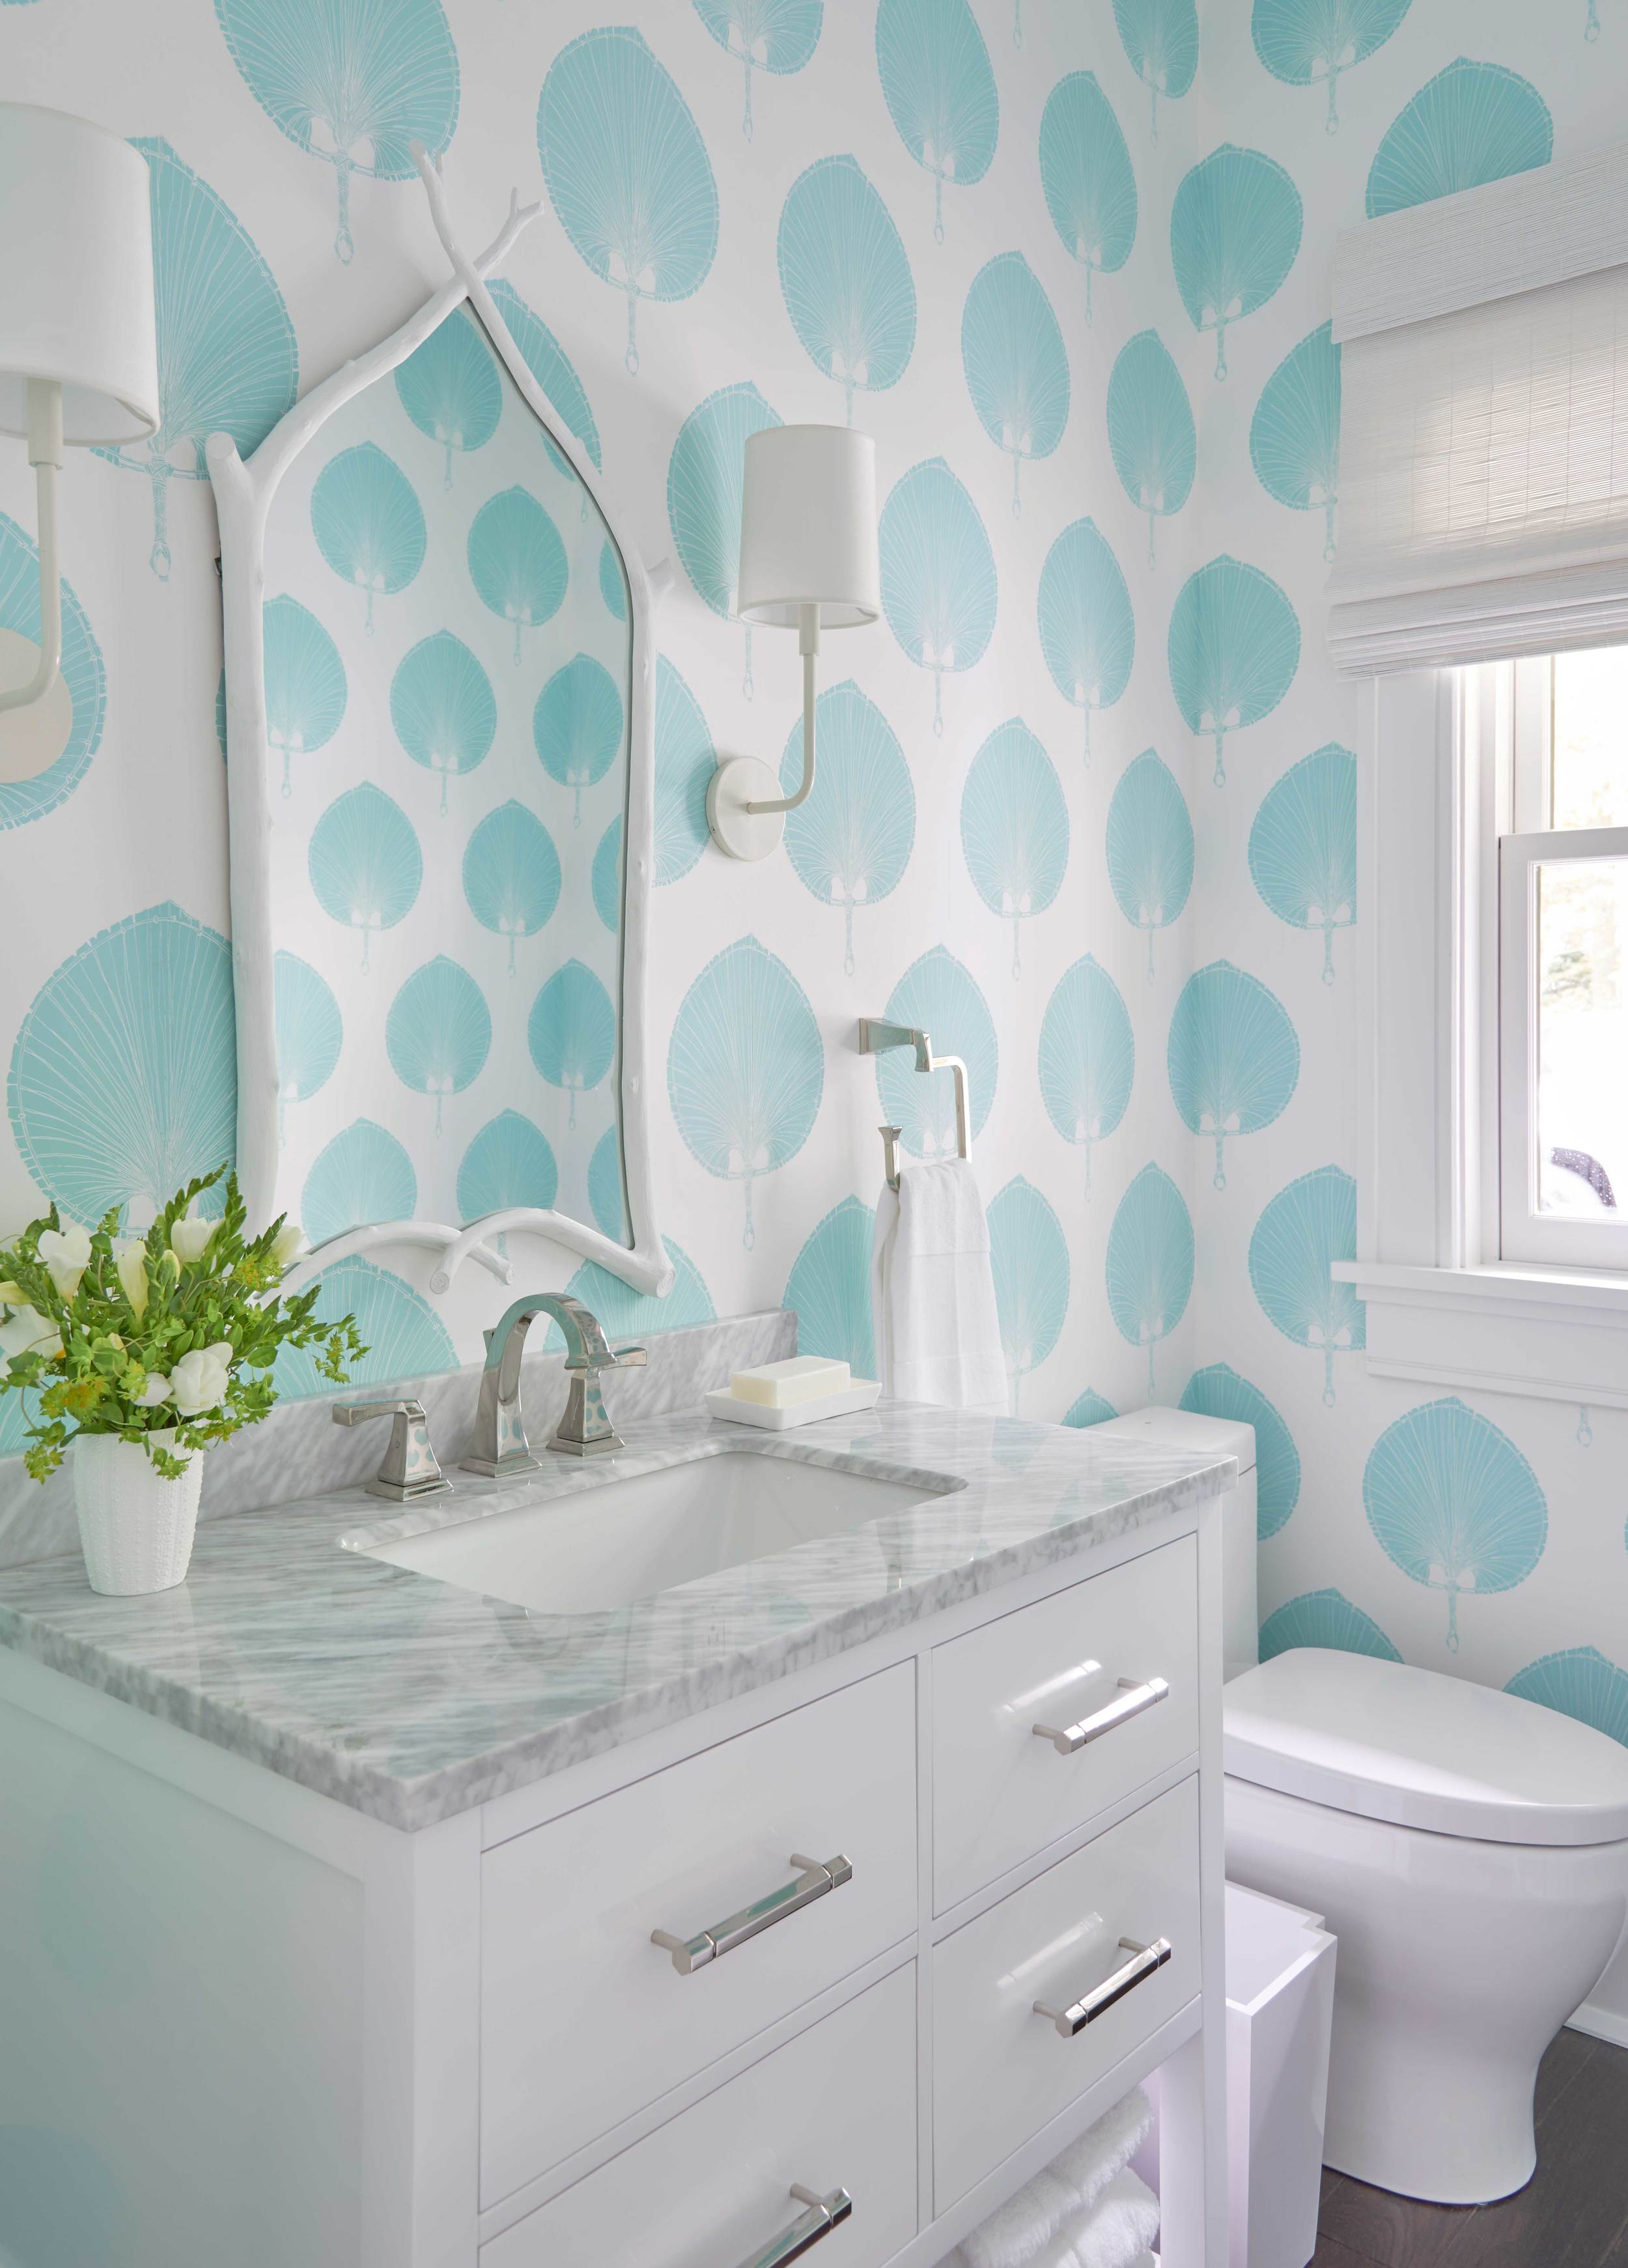 Meg-Braff---Coastal-Living--Idea--Bathroom-Blue-Palm-Wallpaper.jpg